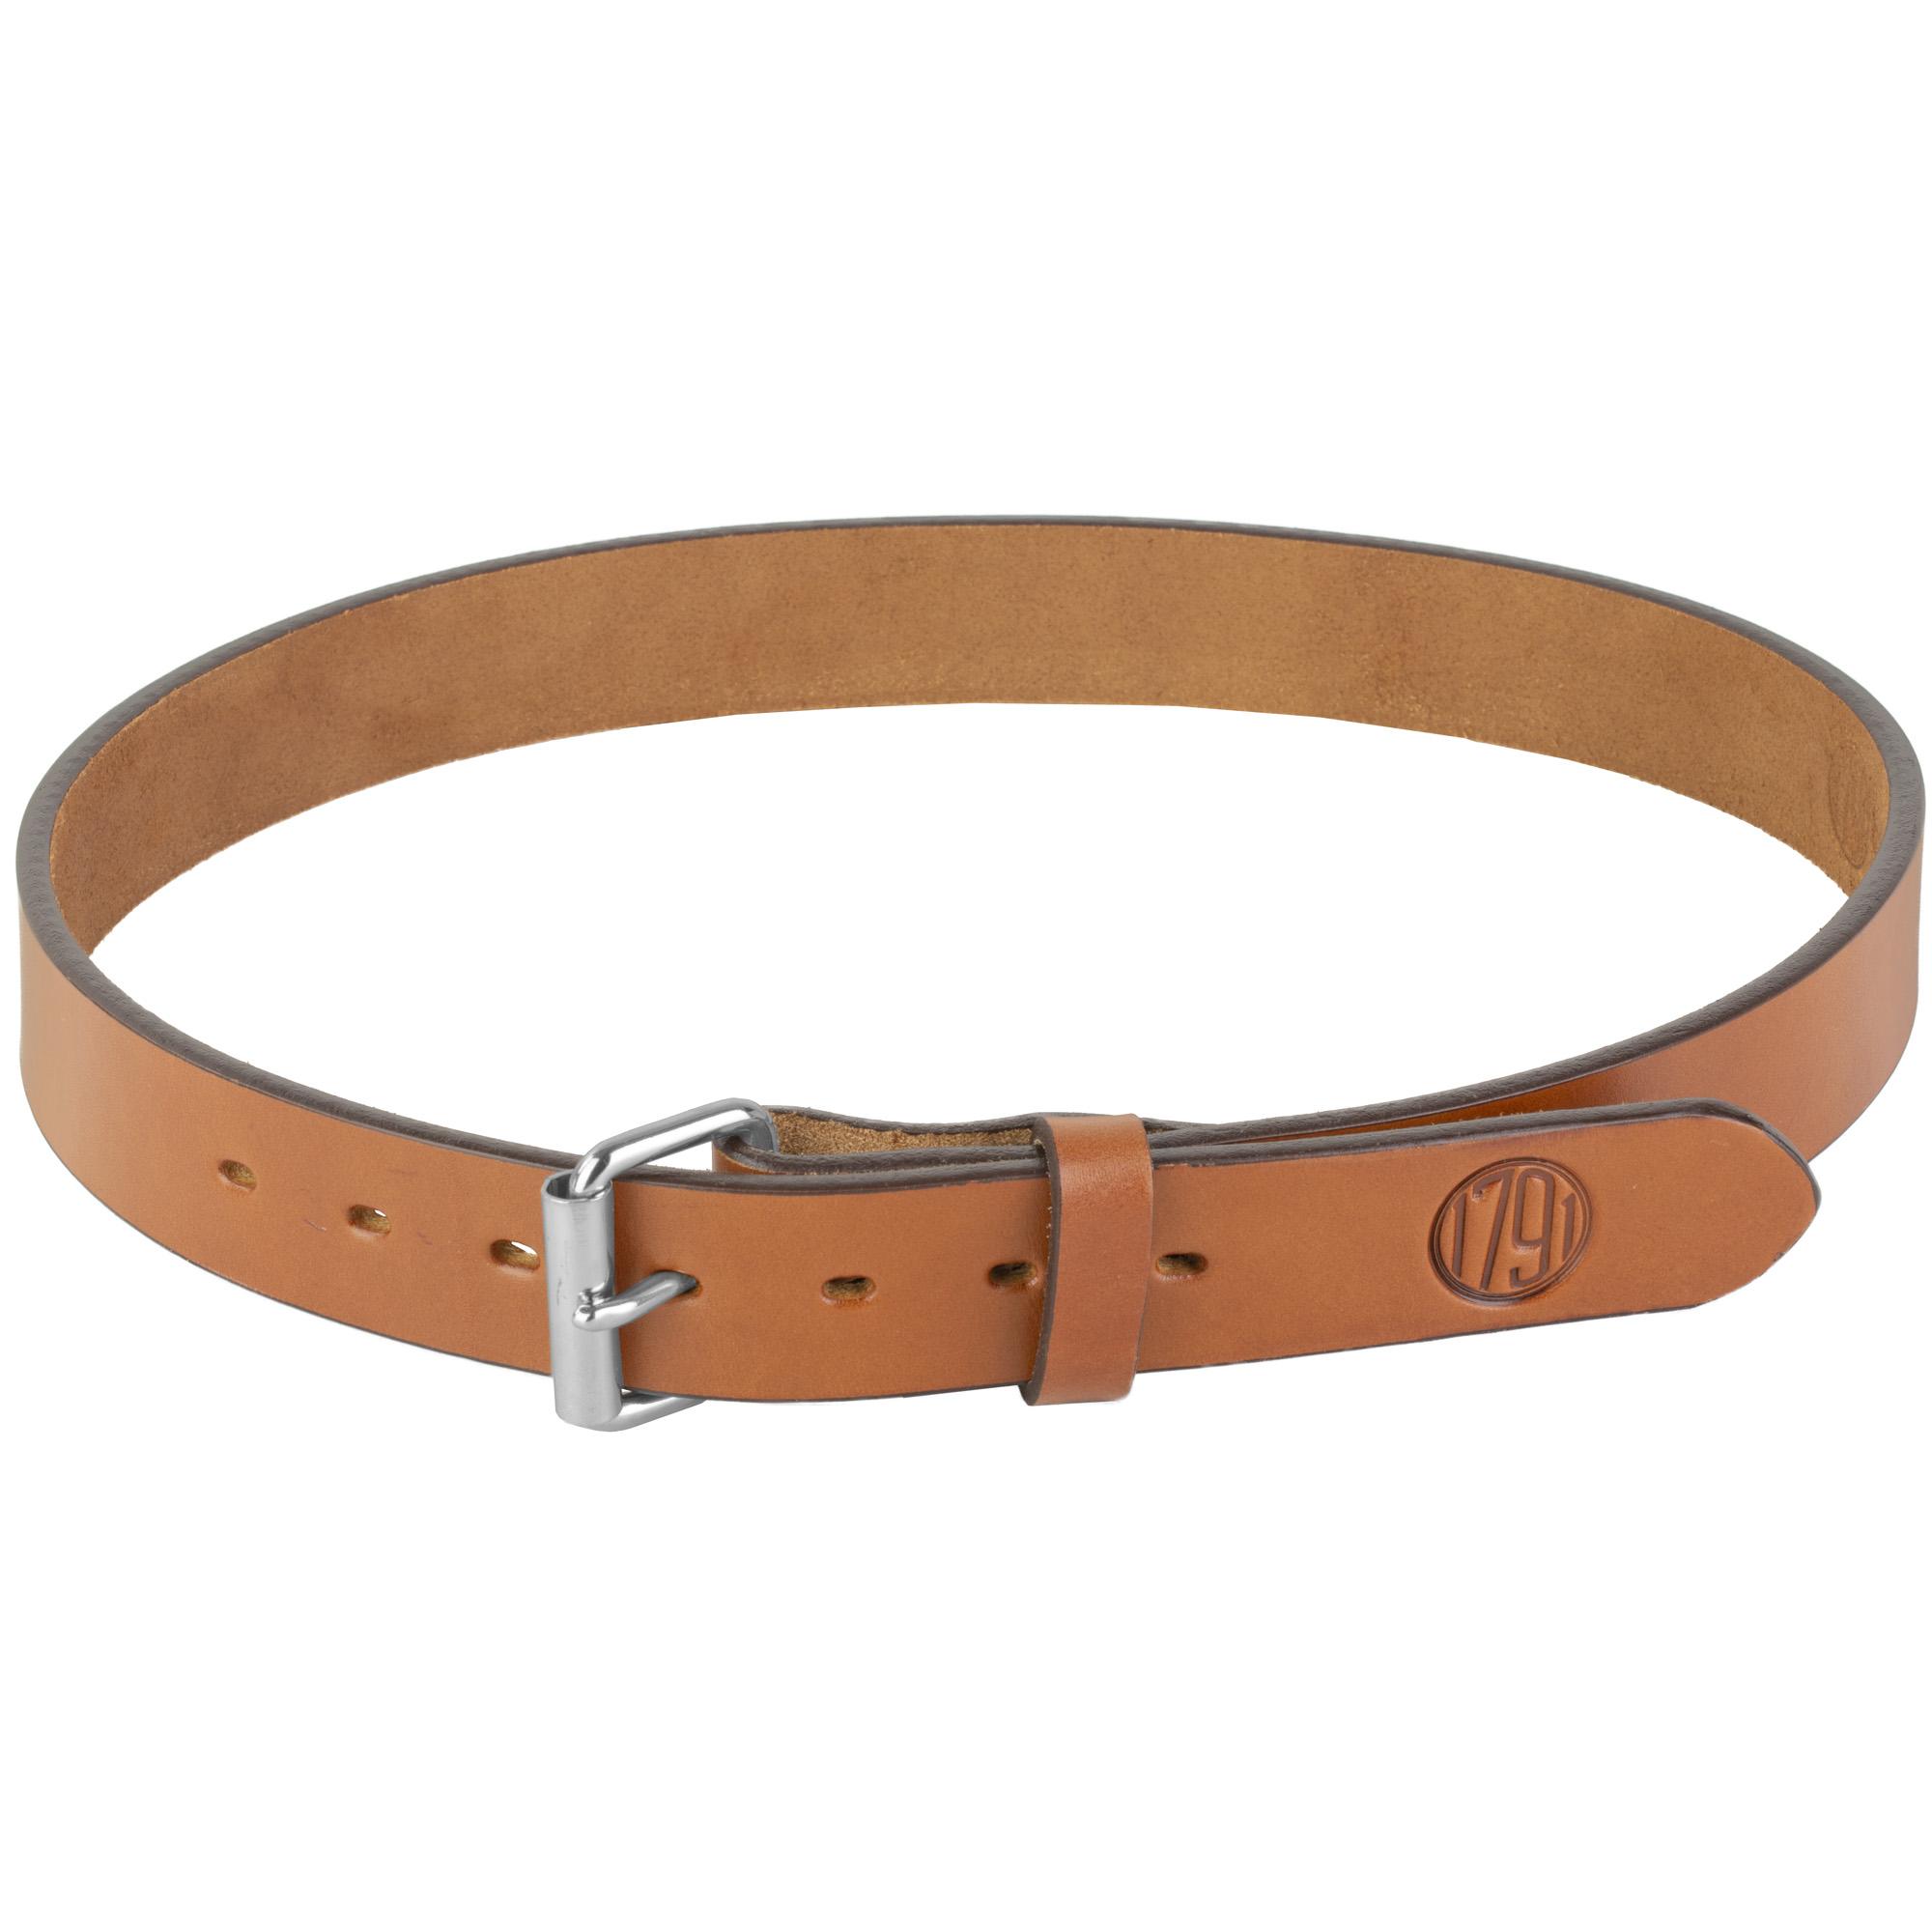 1791 Belt 01 Classic Brown Sz 32/36